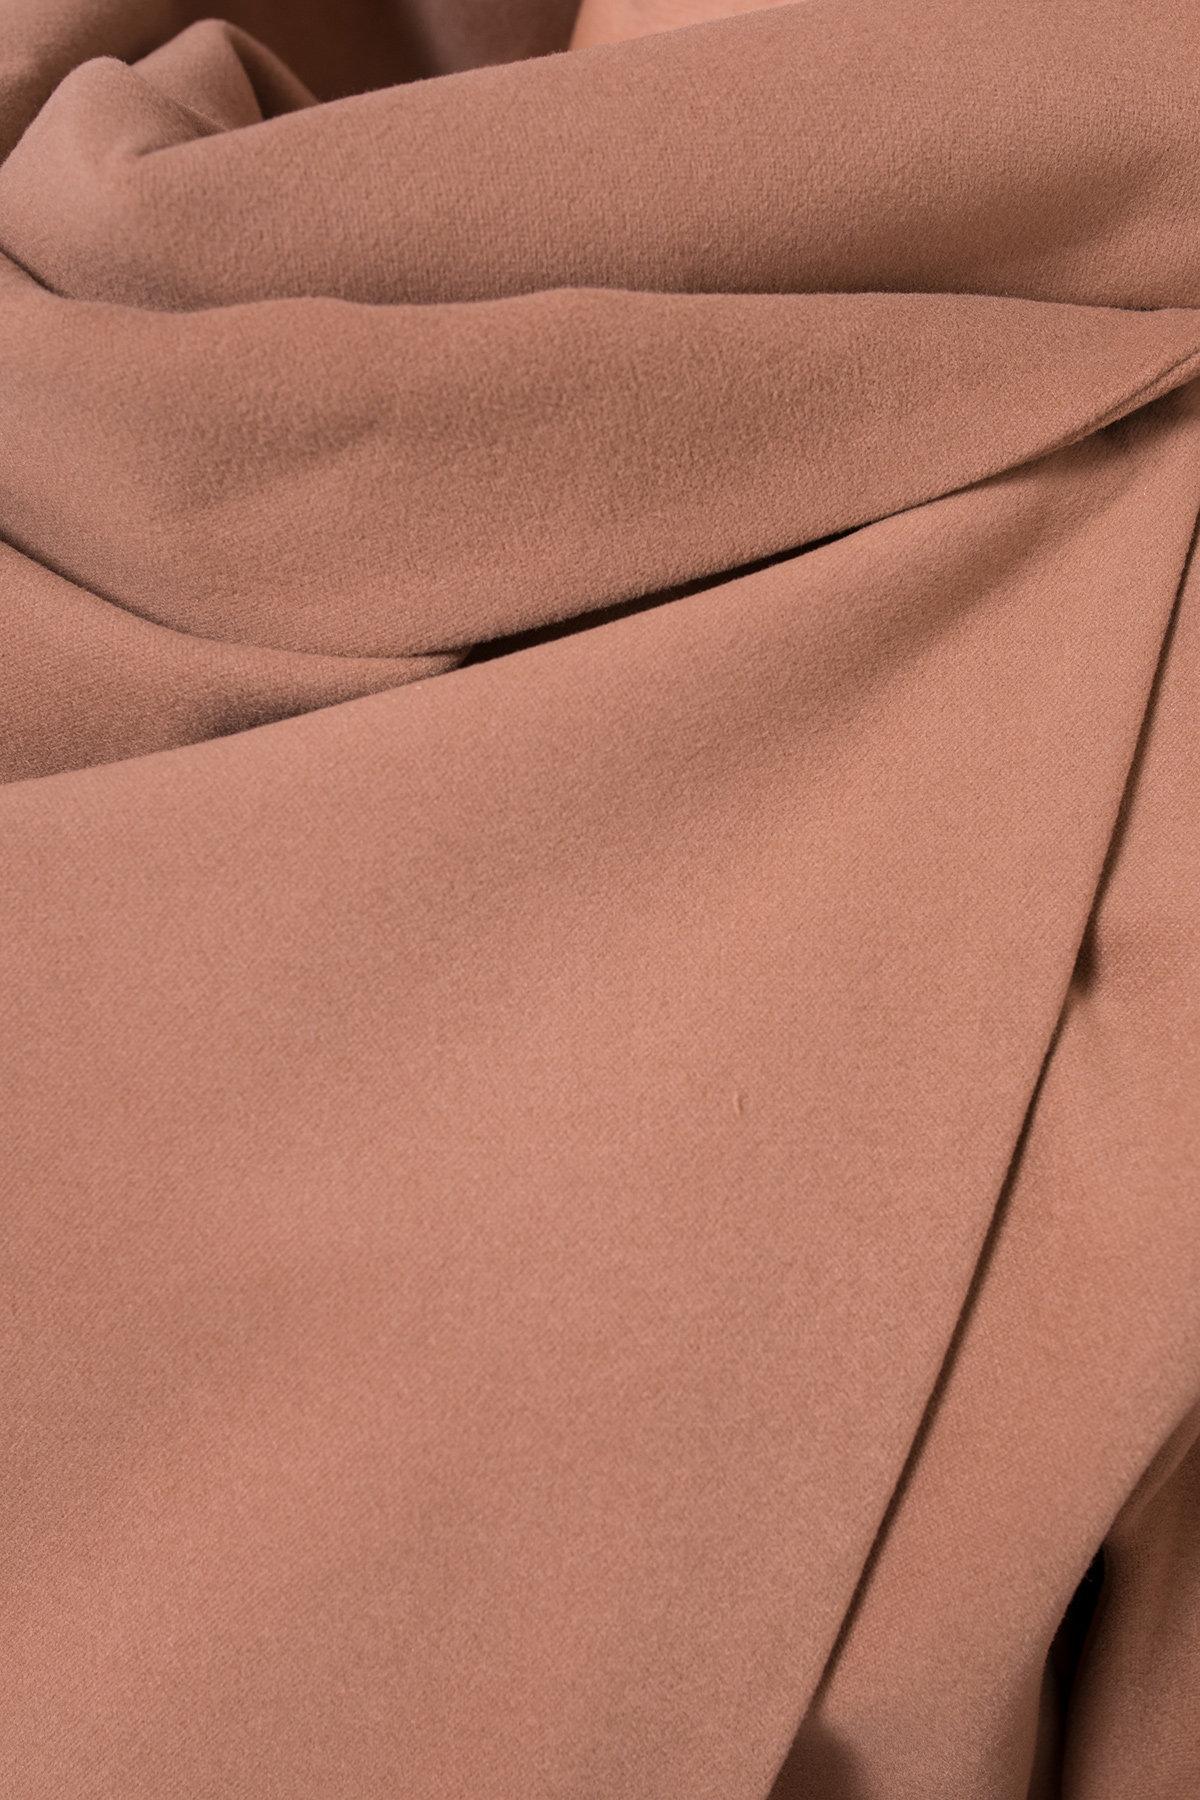 Пальто Эльгранде Donna 3390 Цвет: Бежевый Темный